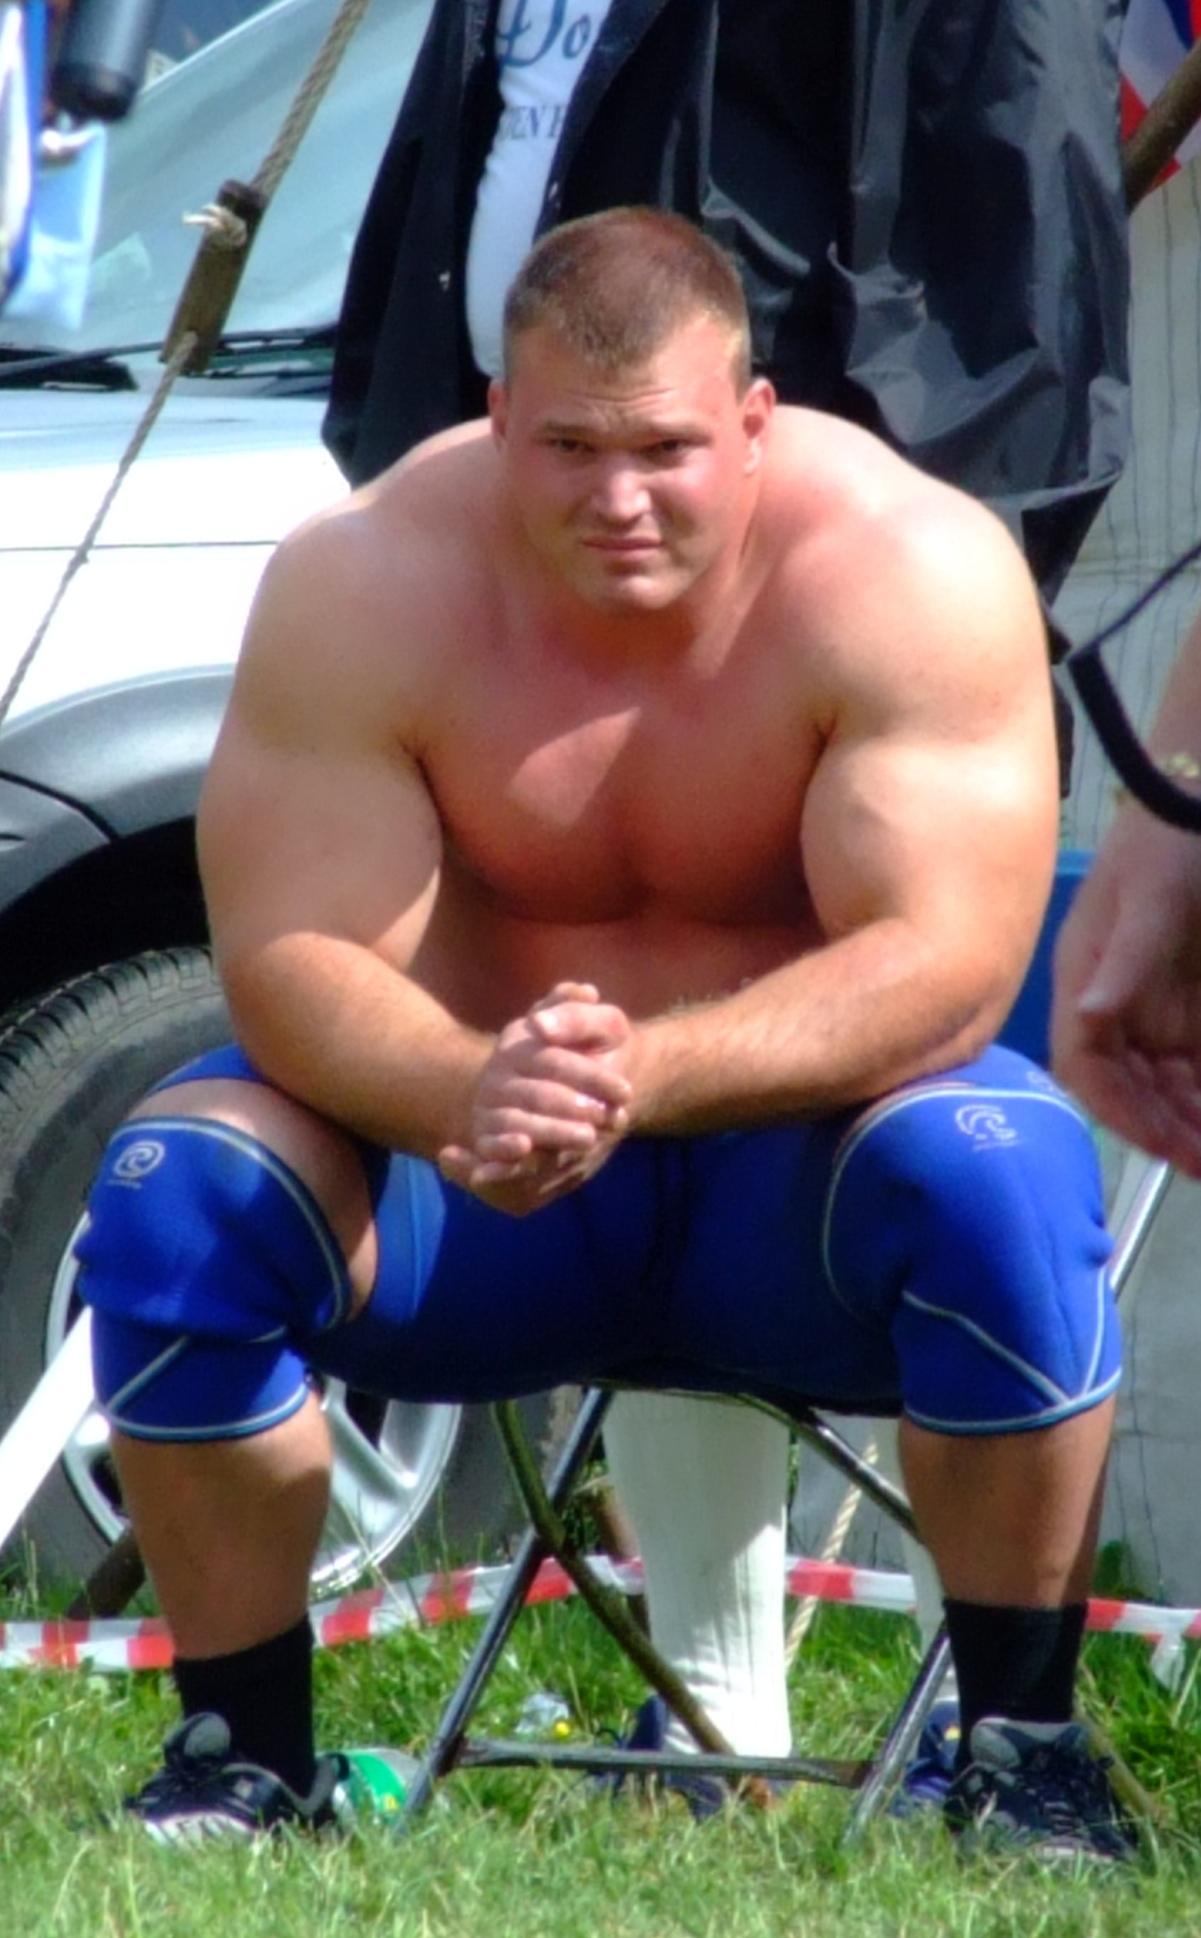 Chubby gay polish men with big dicks trace 9